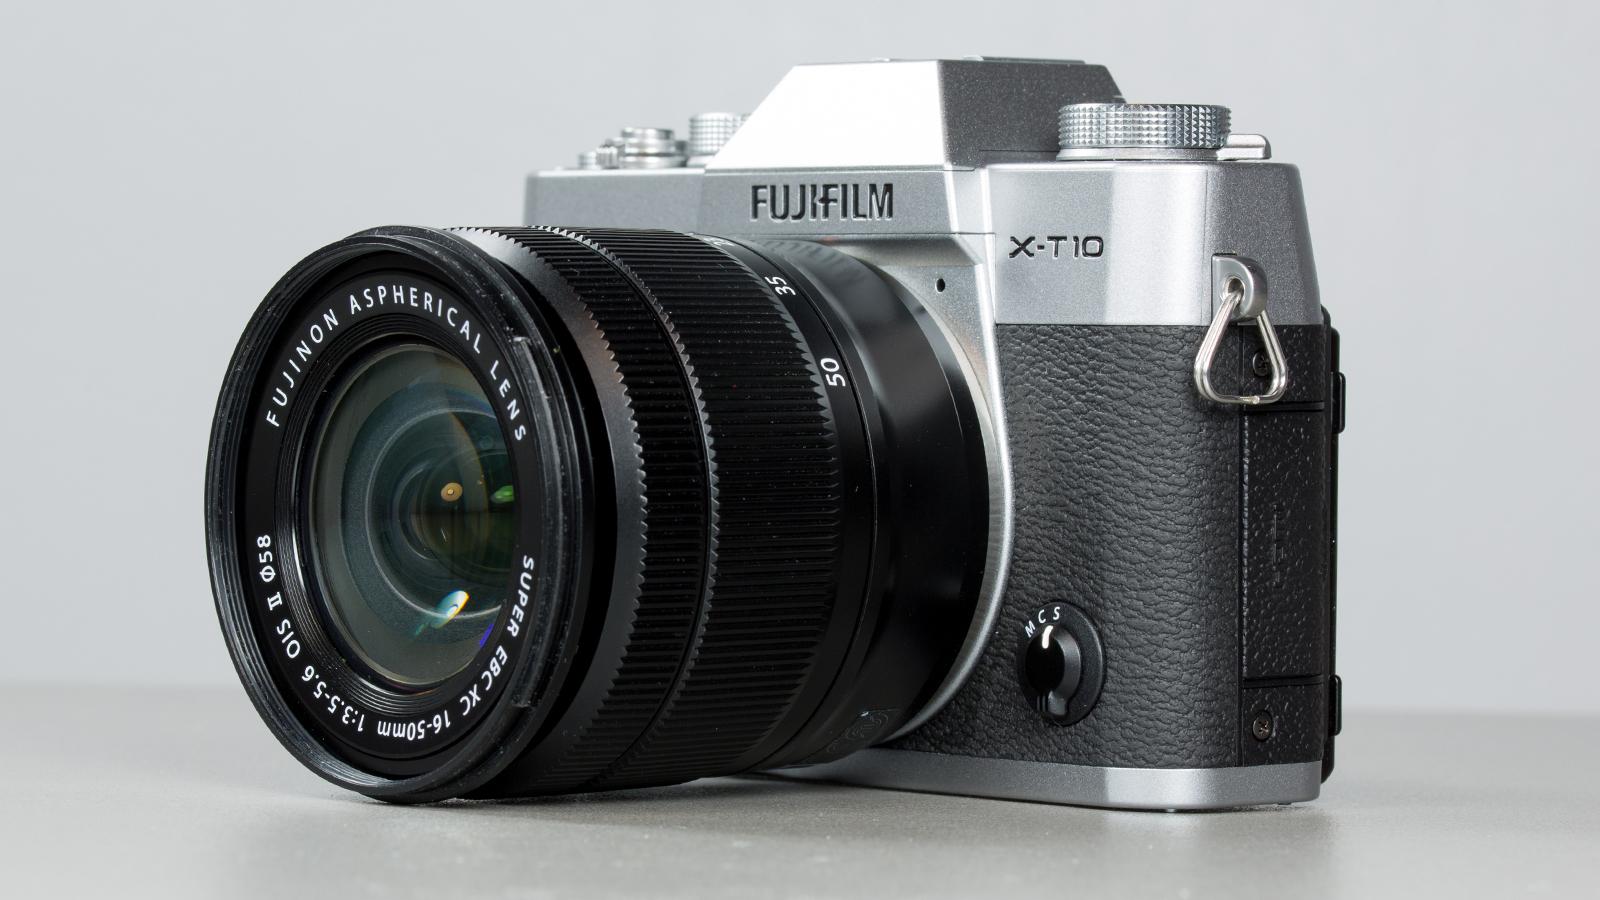 Fujifilm-X-T10-DT-004-kylg